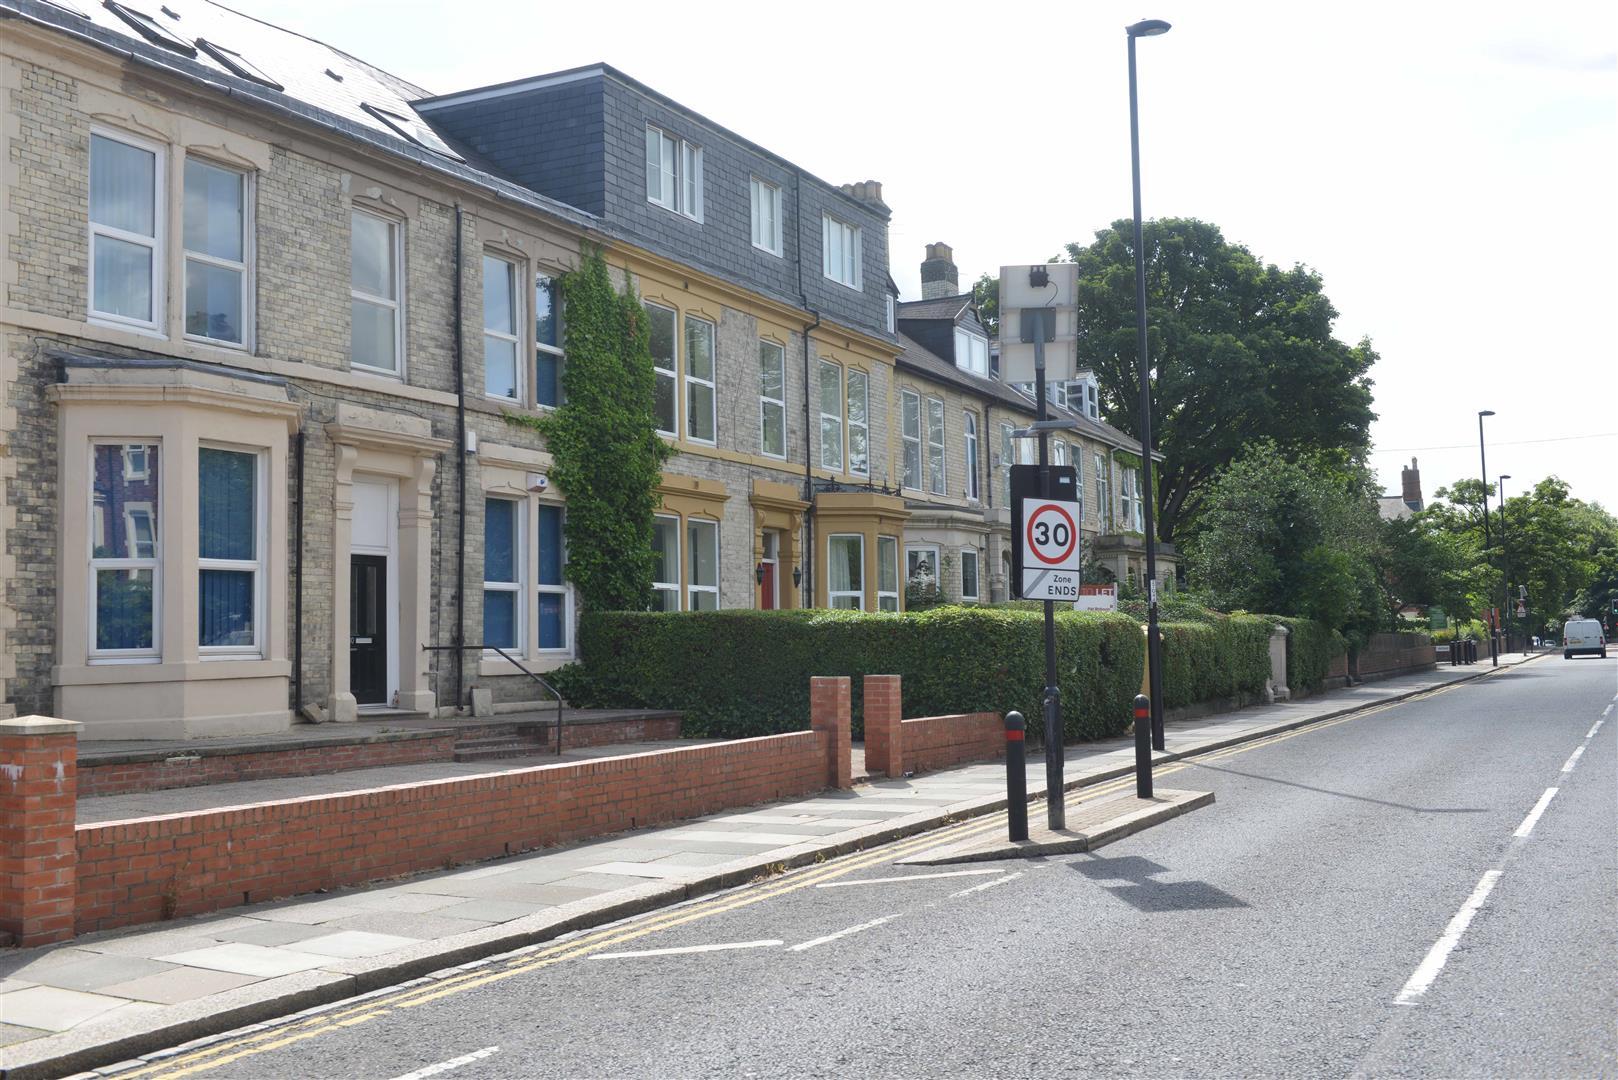 4 bed apartment to rent in Newcastle Upon Tyne, NE2 2AJ, NE2